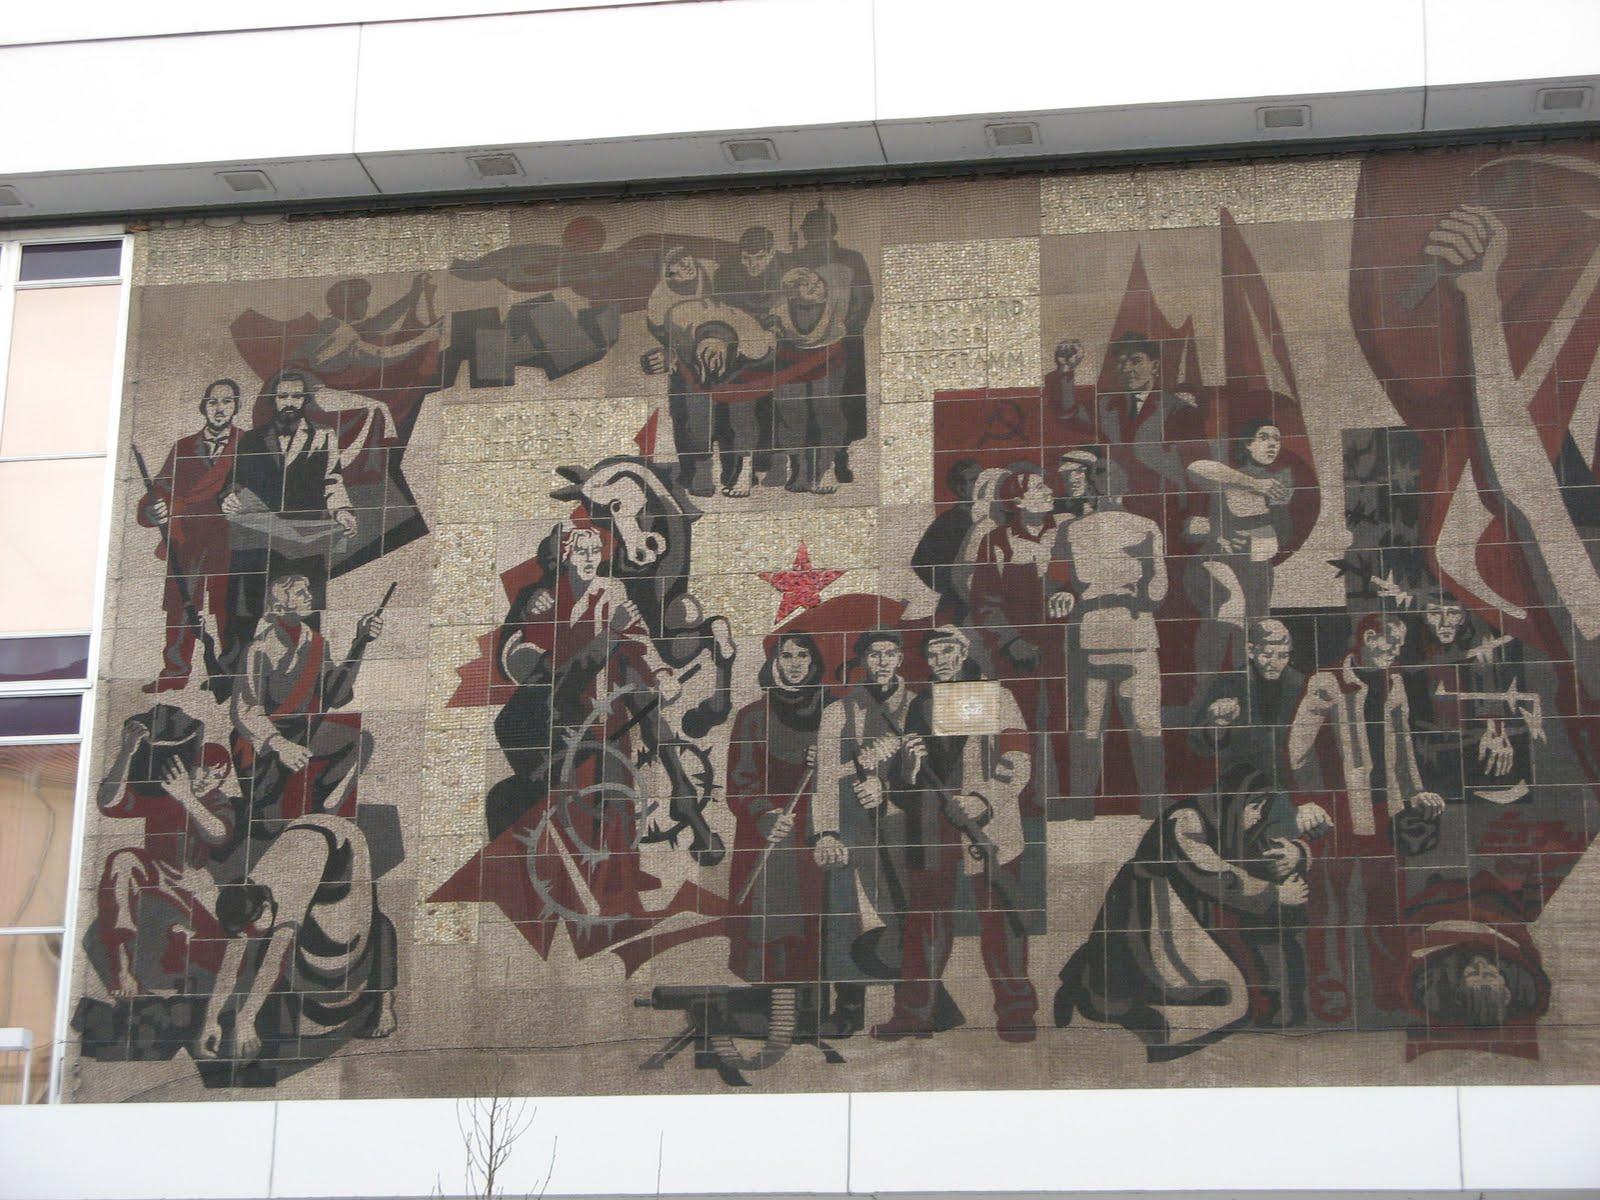 Dresden-Communism-socialism-mosaic-remains